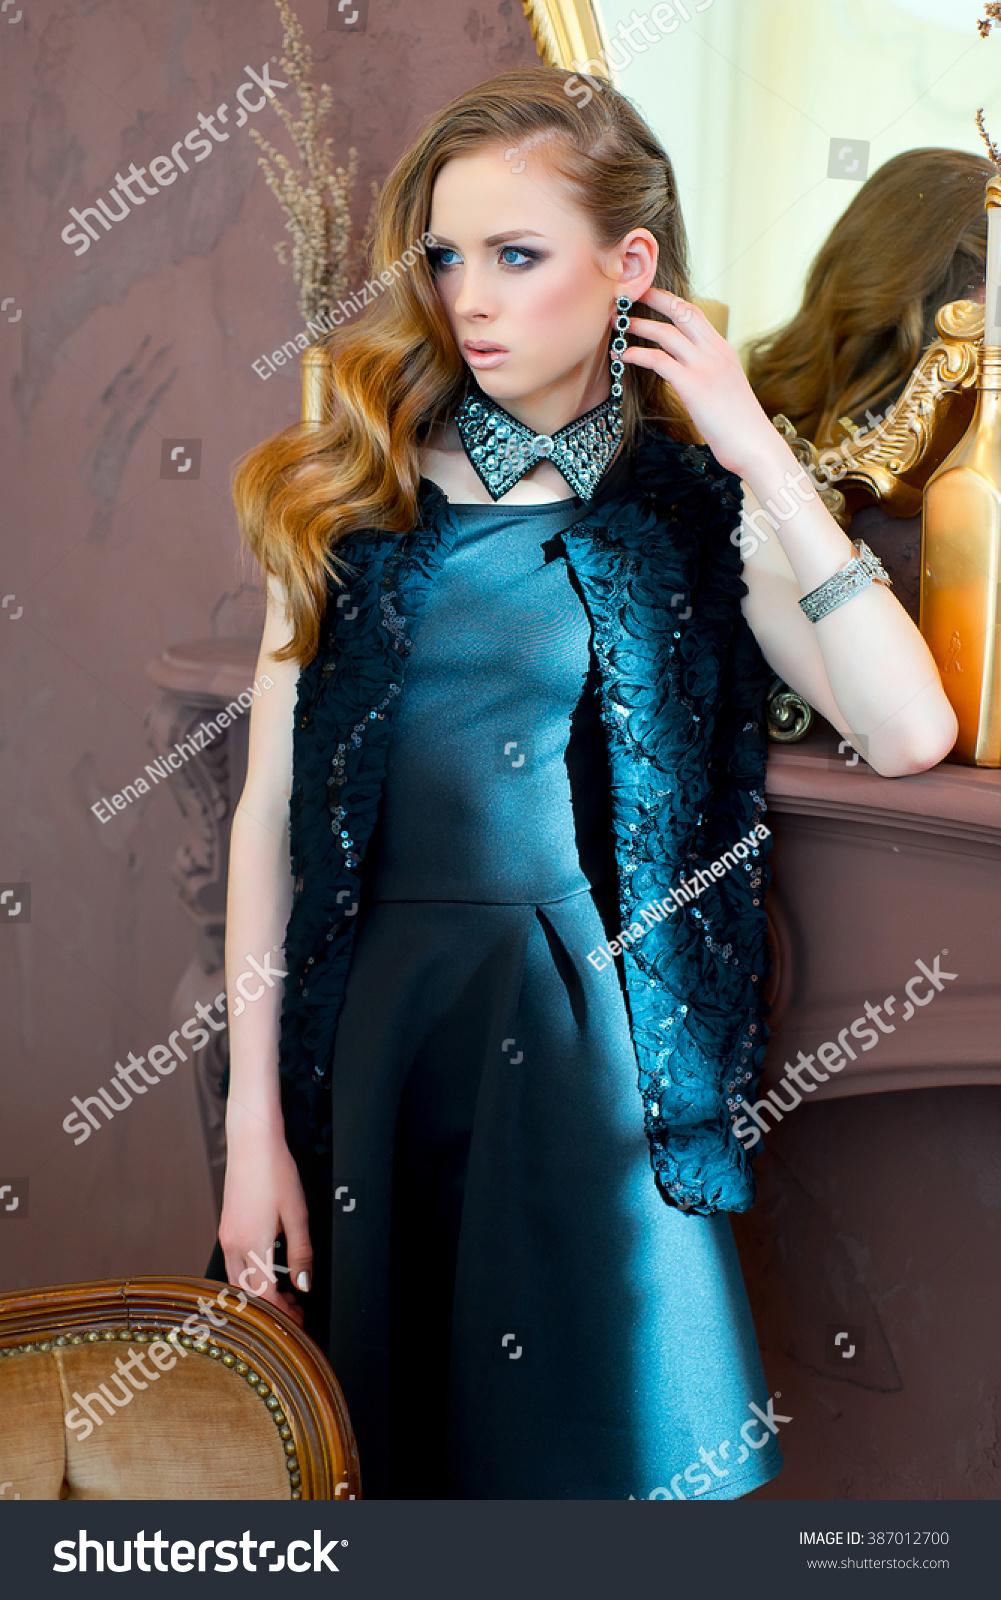 48cf64b4ba25a Elegant Young Girl Black Evening Dress Stock Photo Edit Now